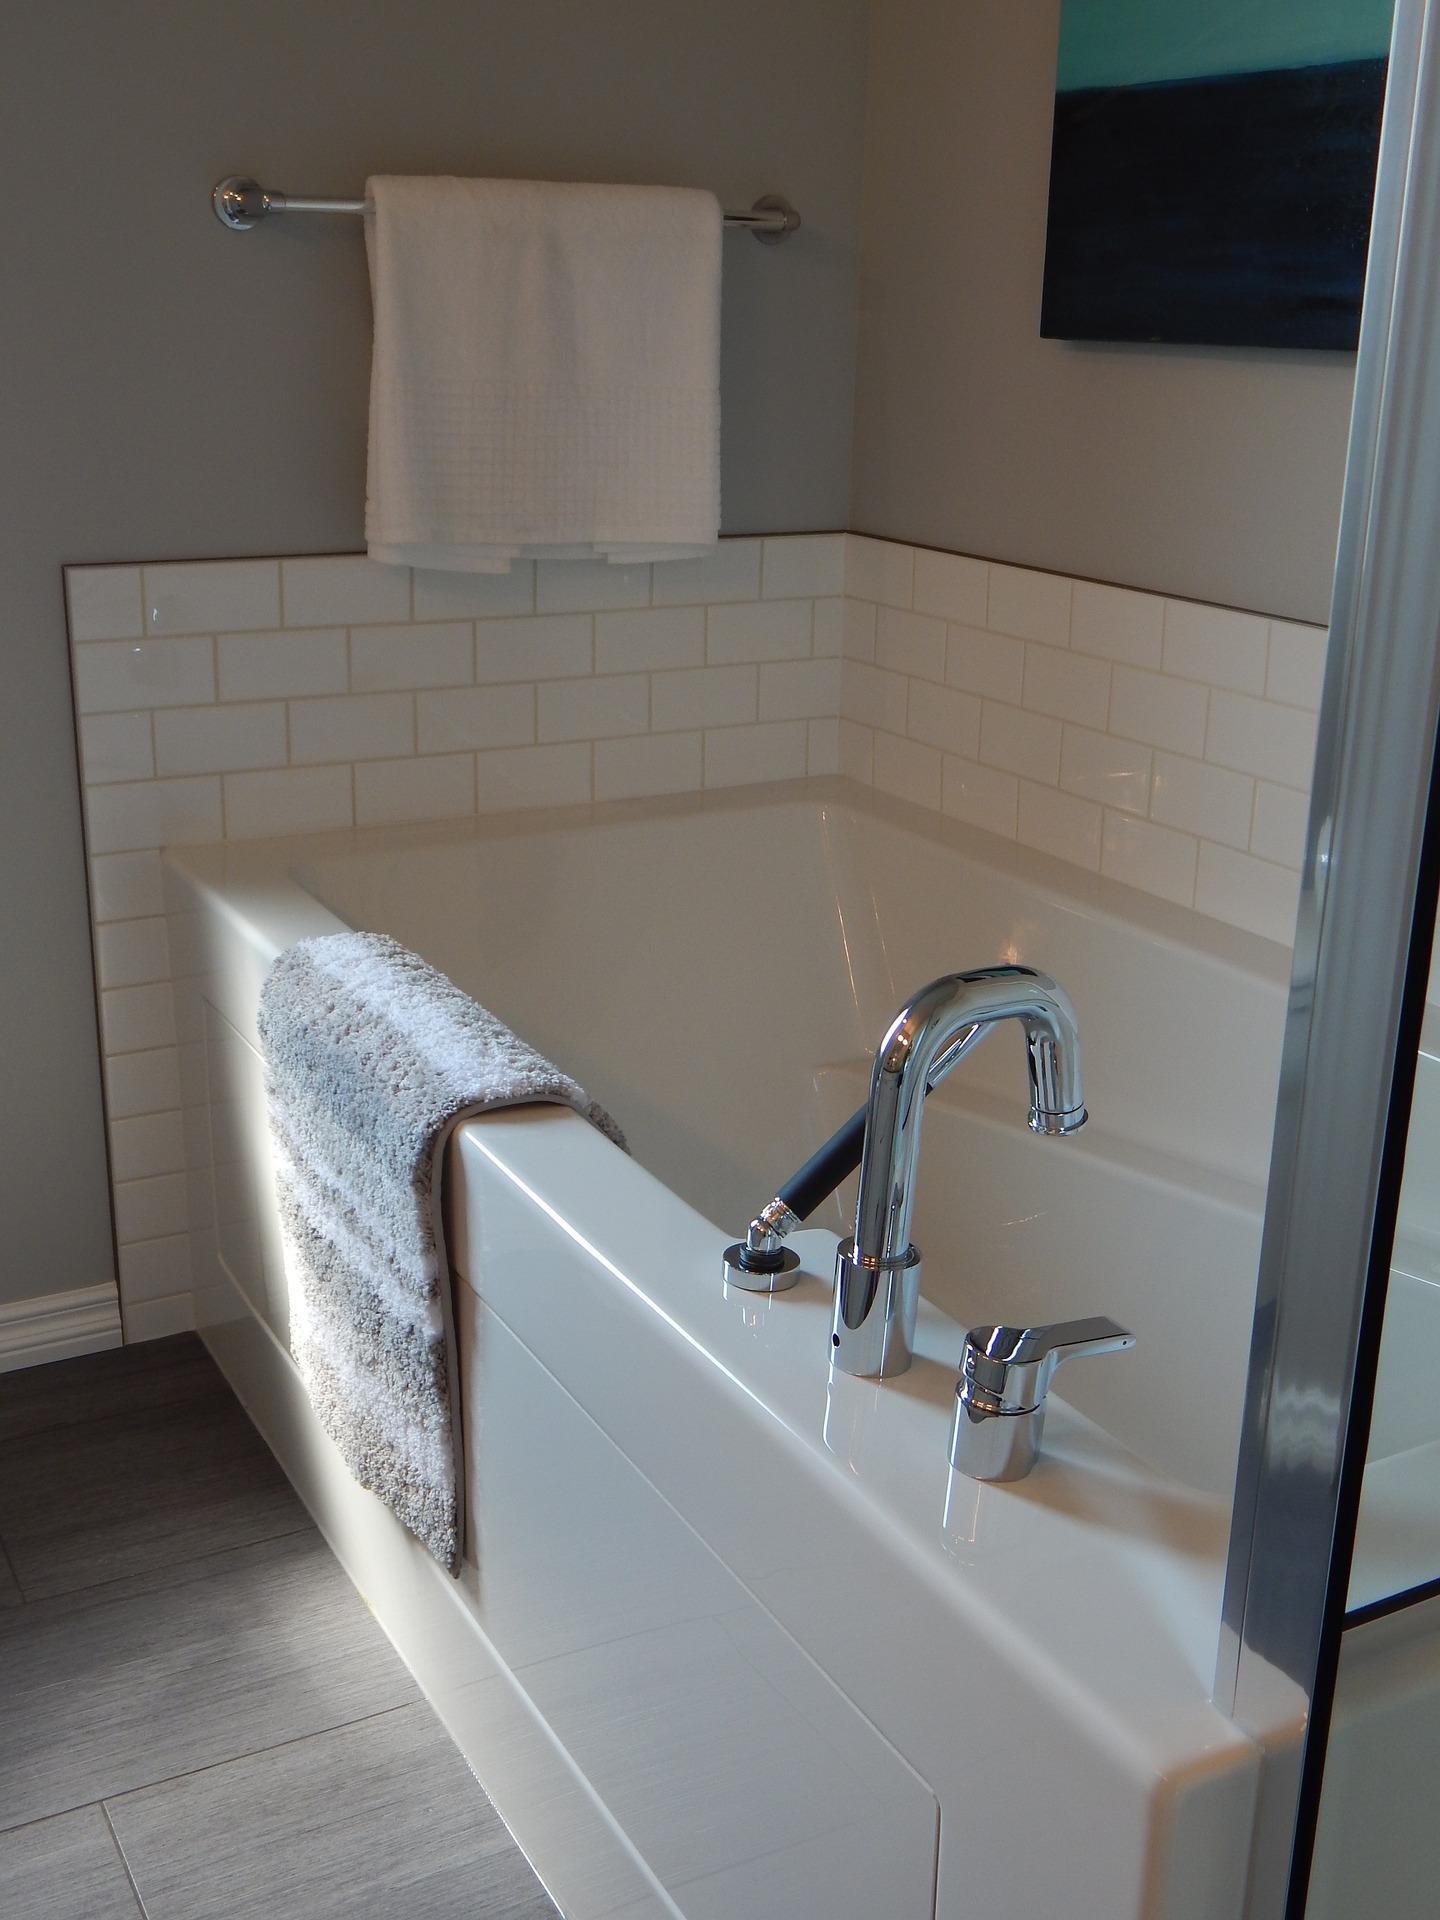 Installation complète de salle de bain à neuf